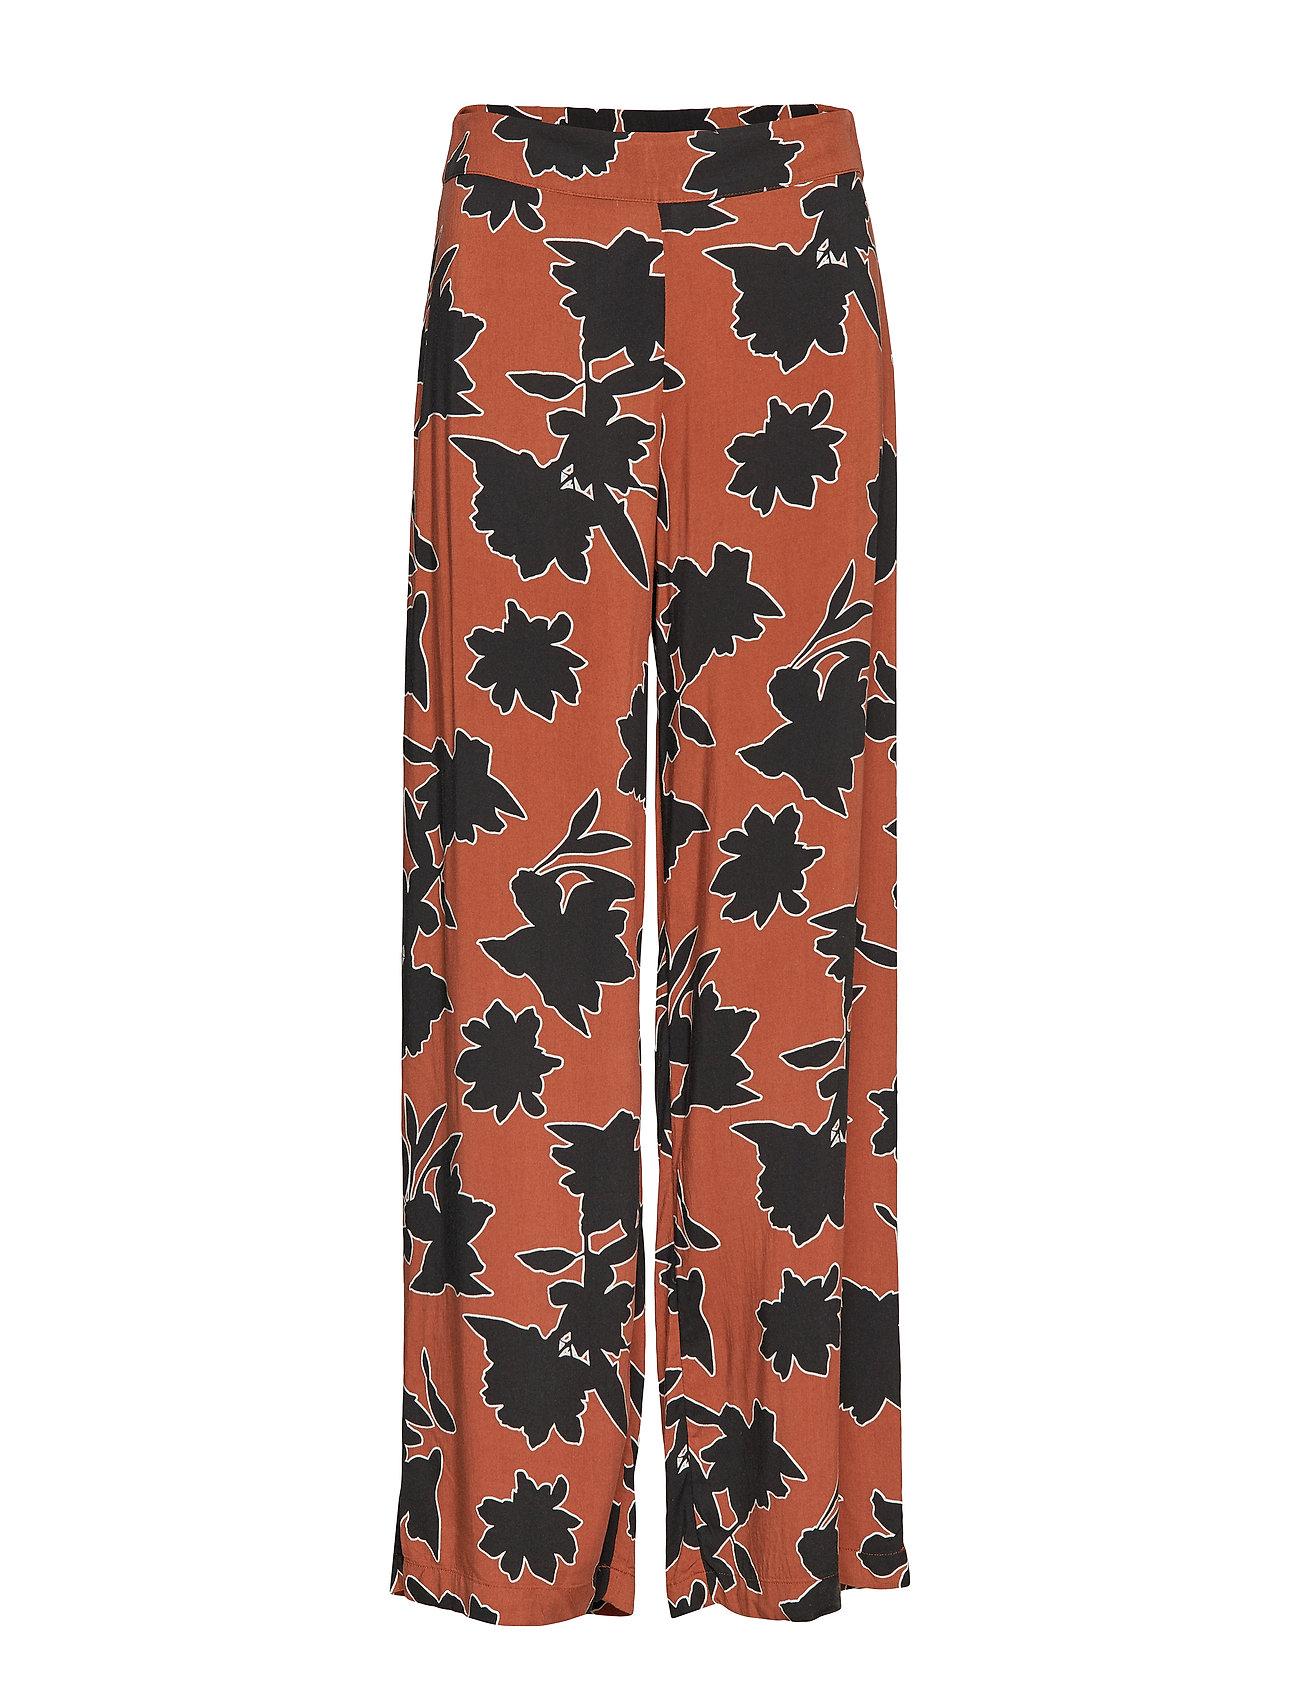 515d47eb Elly Trousers bukser fra Gina Tricot til dame i BOLDFLOWER - Pashion.dk